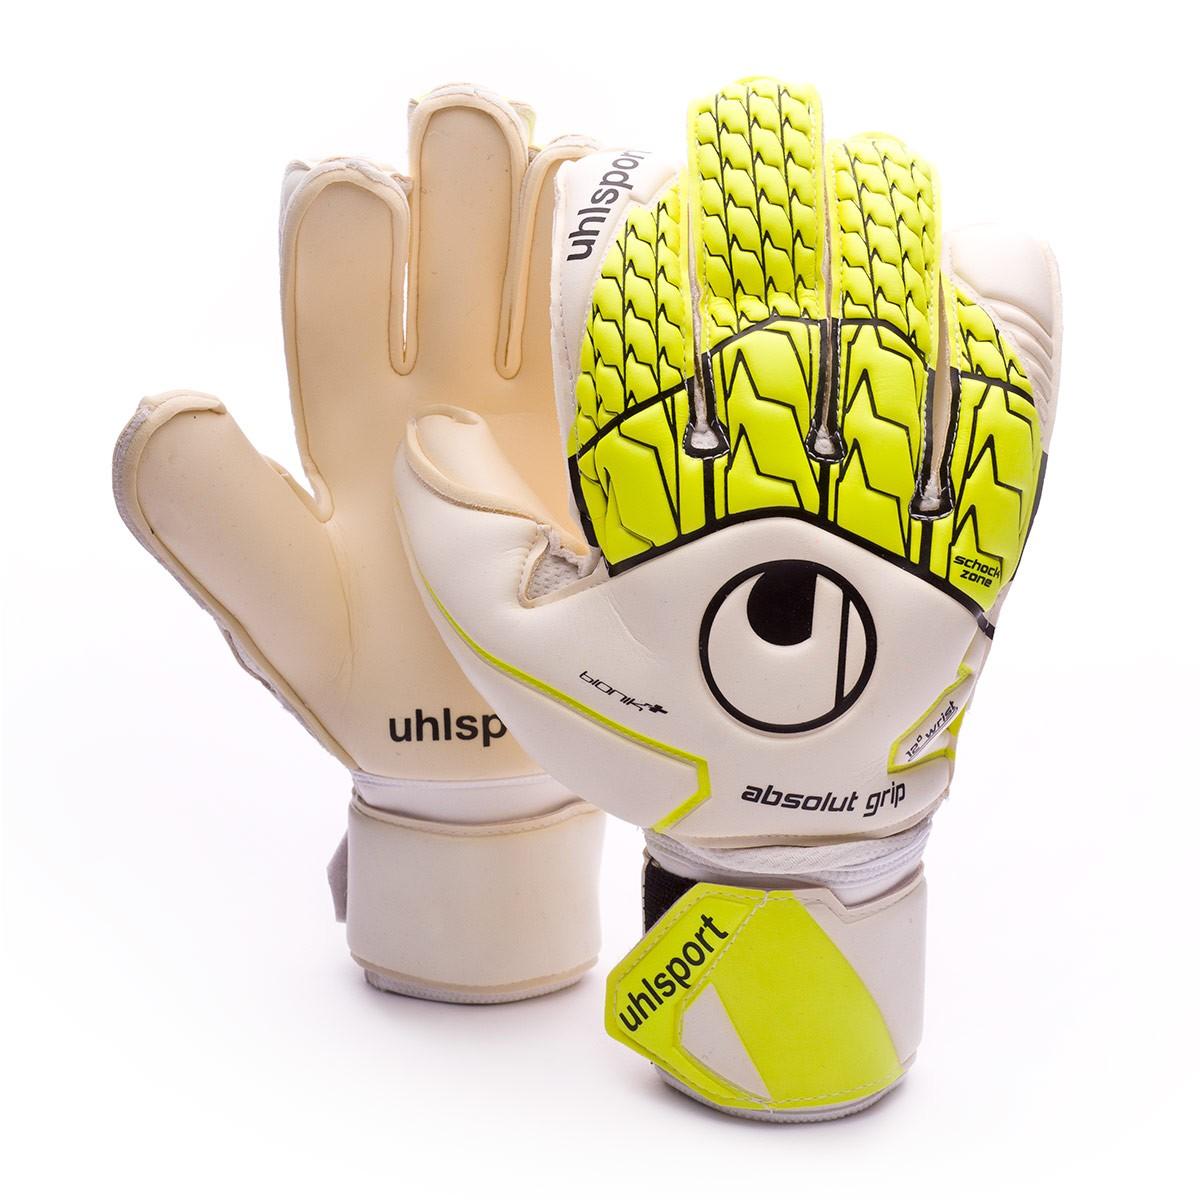 e56997fe4 Glove Uhlsport Absolutgrip Bionik+ White-Fluor yellow-Black - Tienda ...